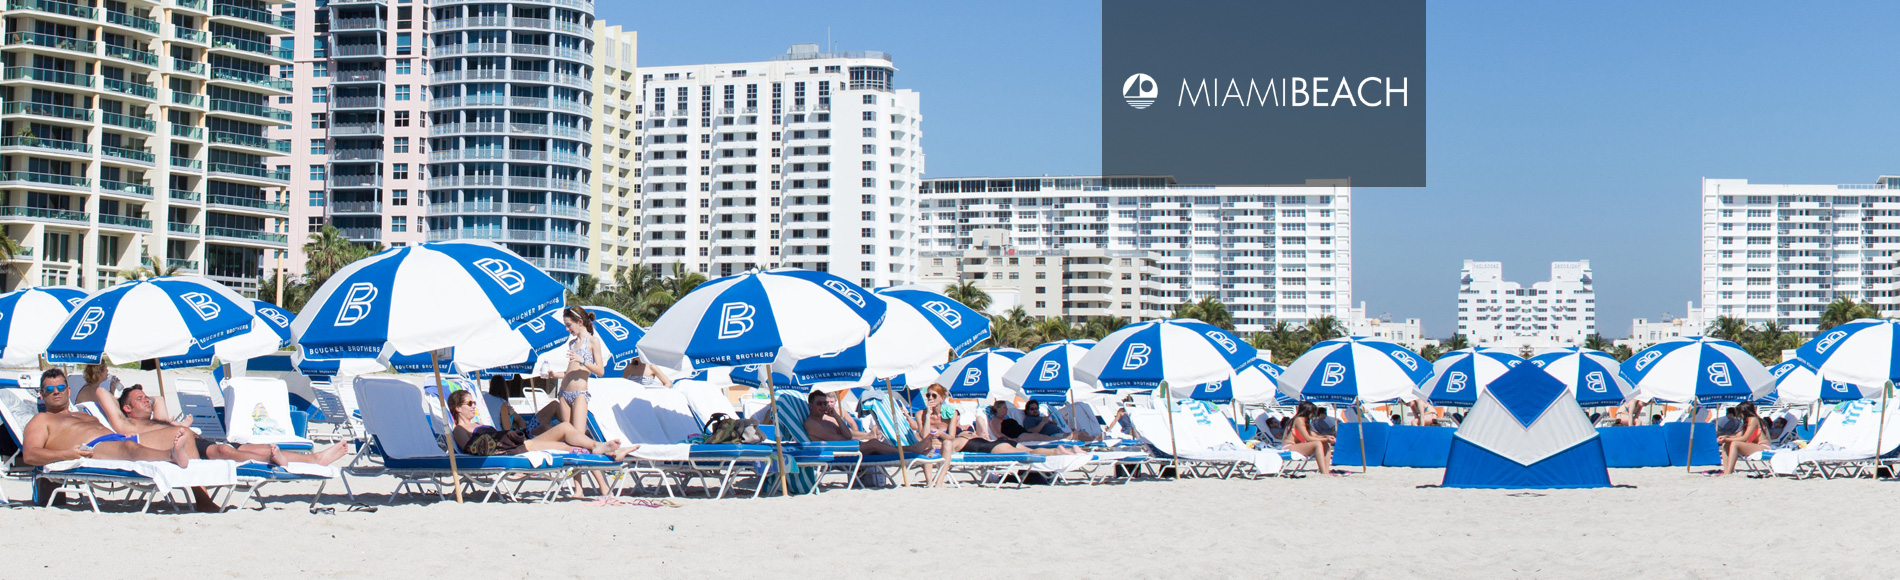 miami_beach_slider